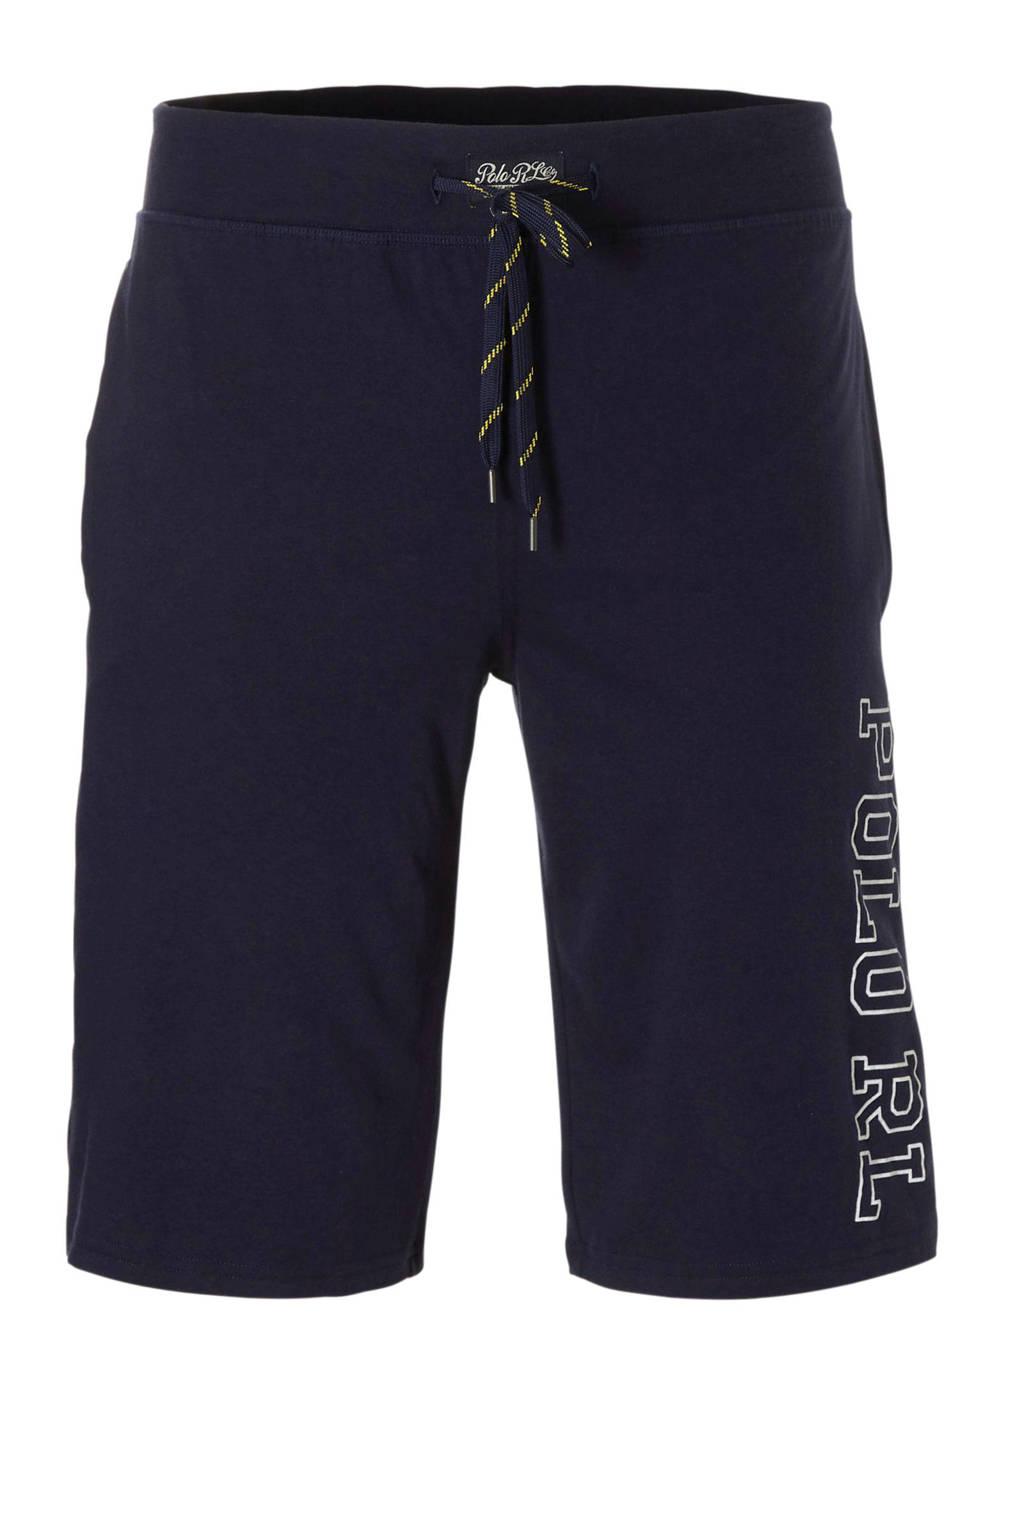 POLO Ralph Lauren pyjamashort met merknaam marine, Marine